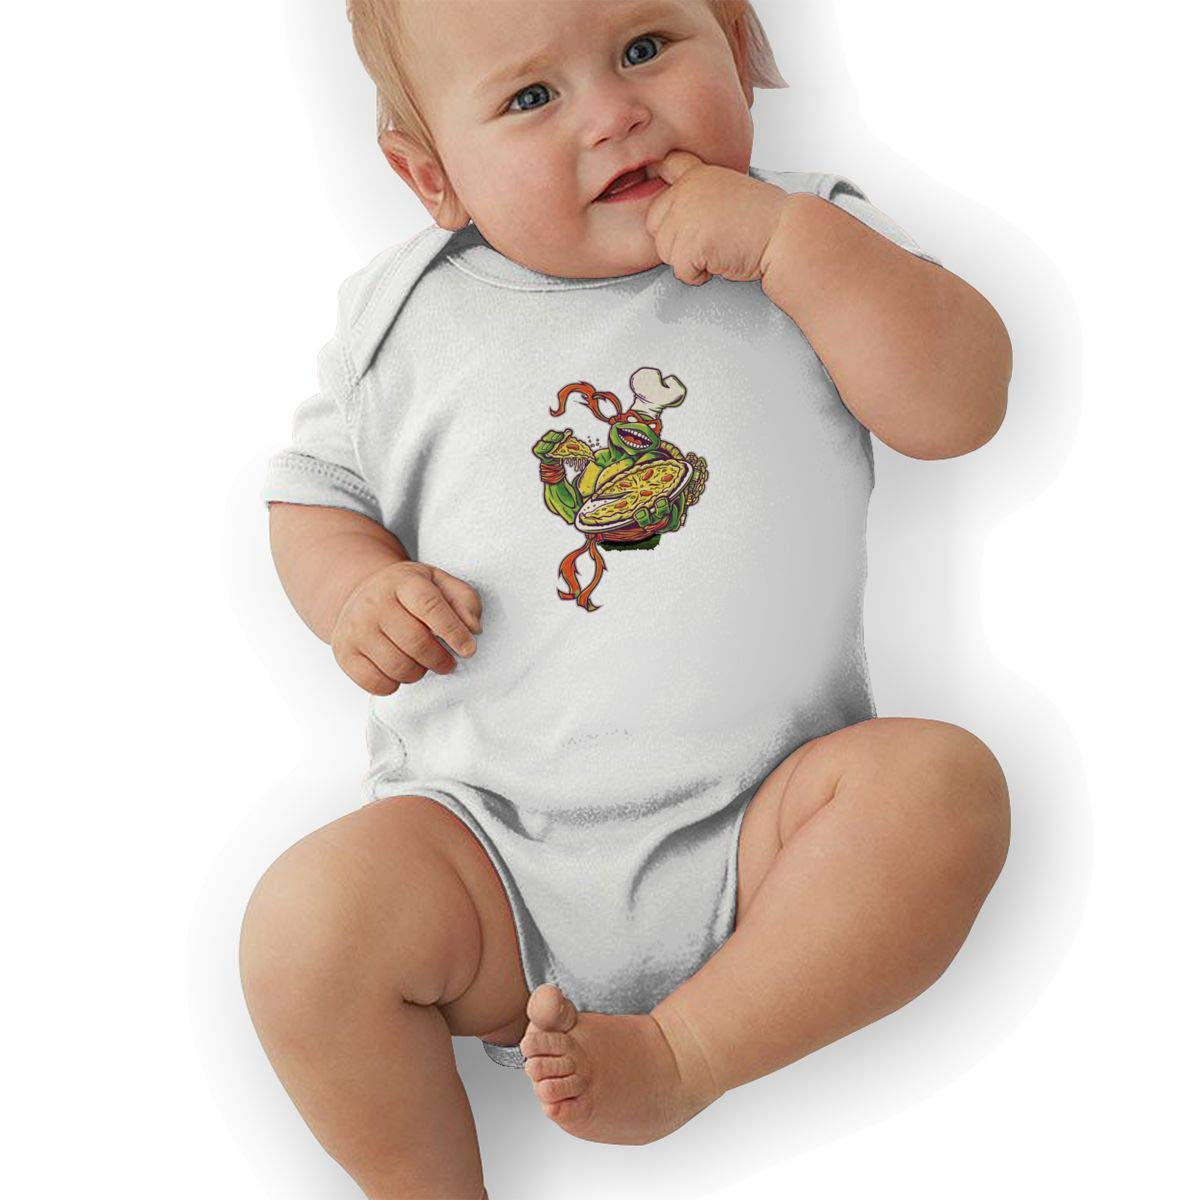 Turtle Pizza Baby Romper 0-18 Months Newborn Baby Girls Boys Layette Rompers Black